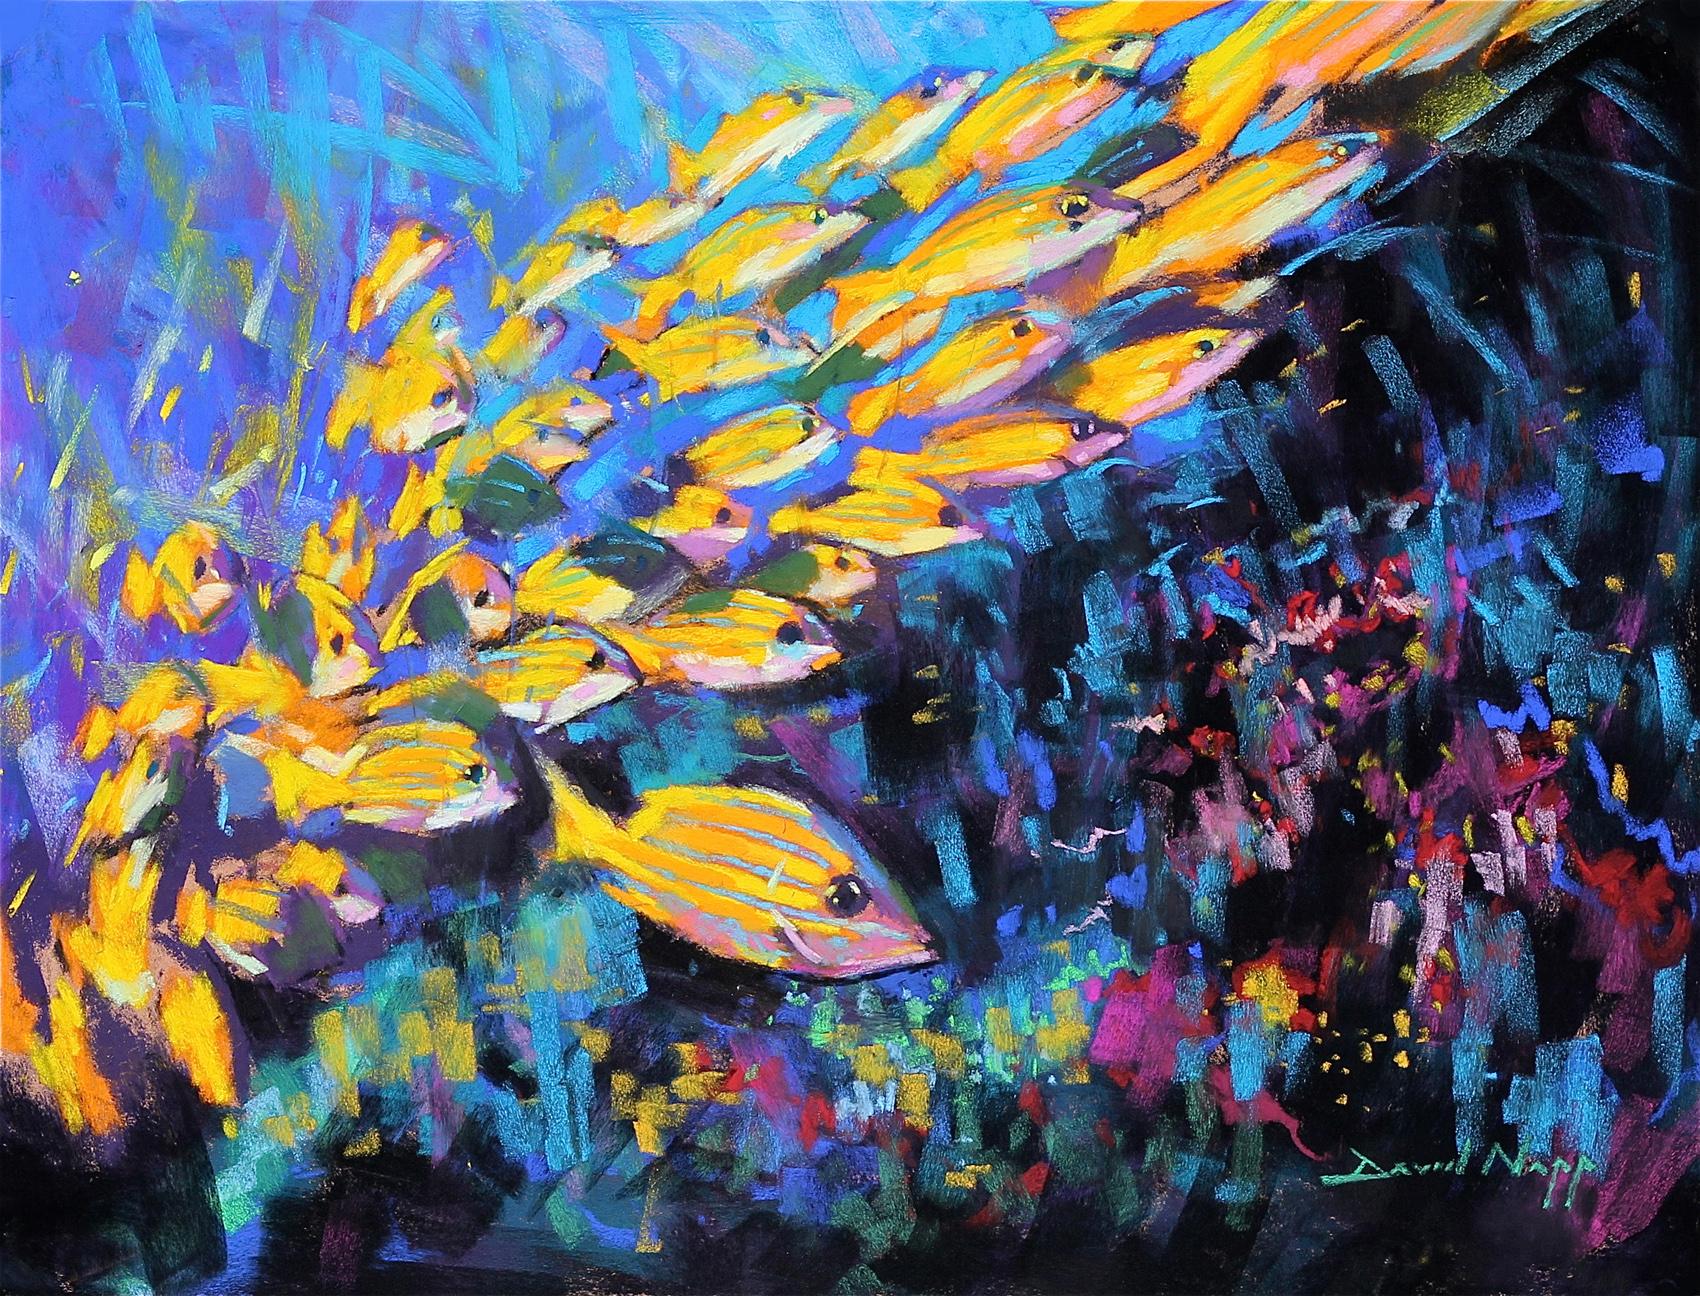 Goldrush by David Napp